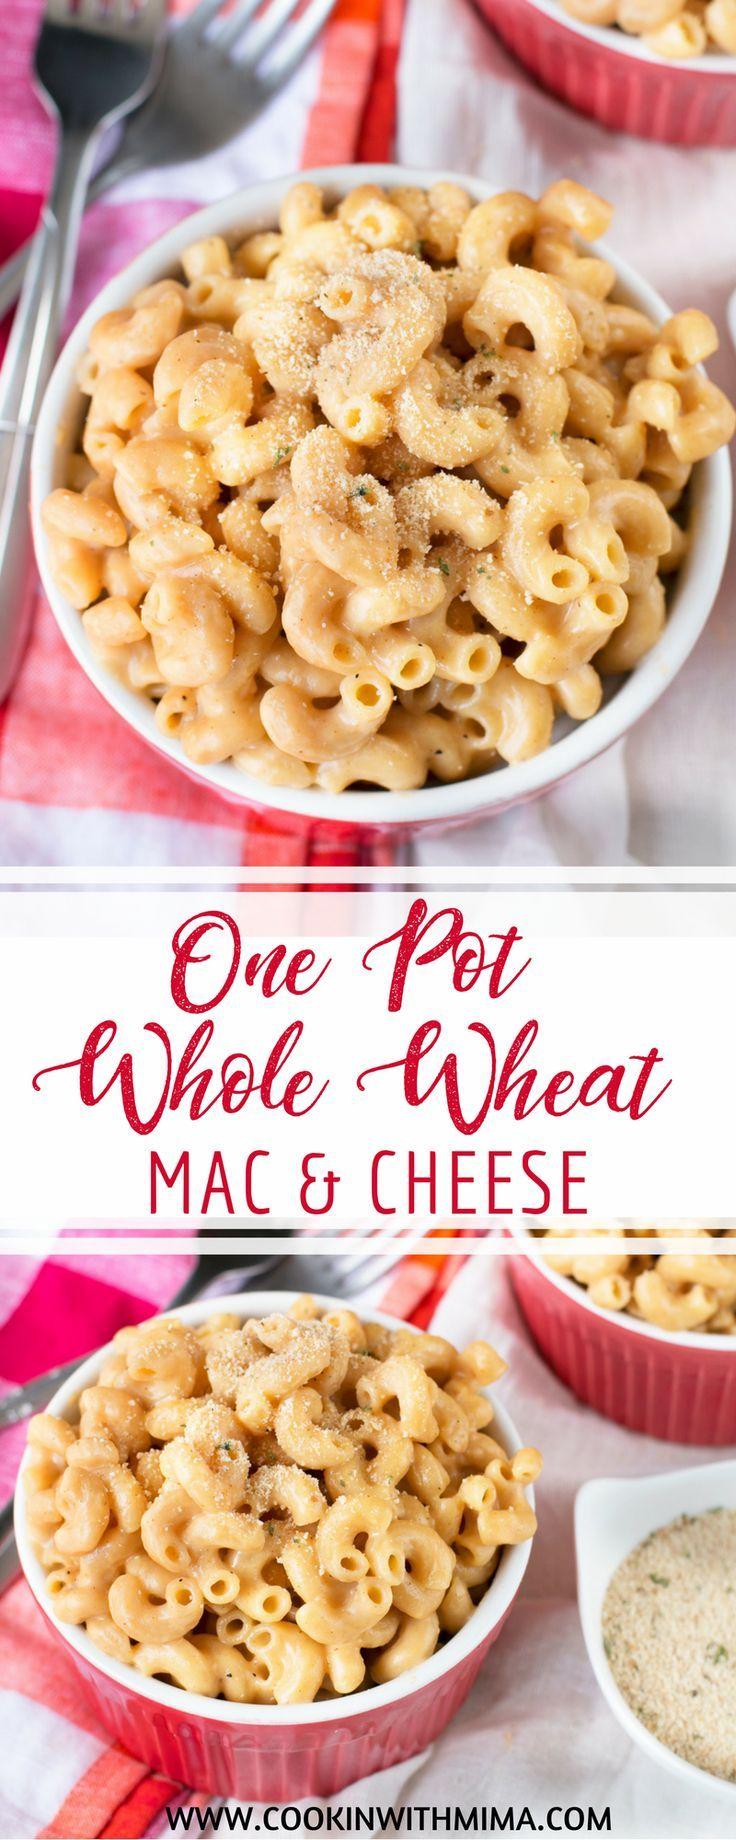 one pot whole wheat macaroni and cheese recipe recipes wheat pasta recipes food pinterest